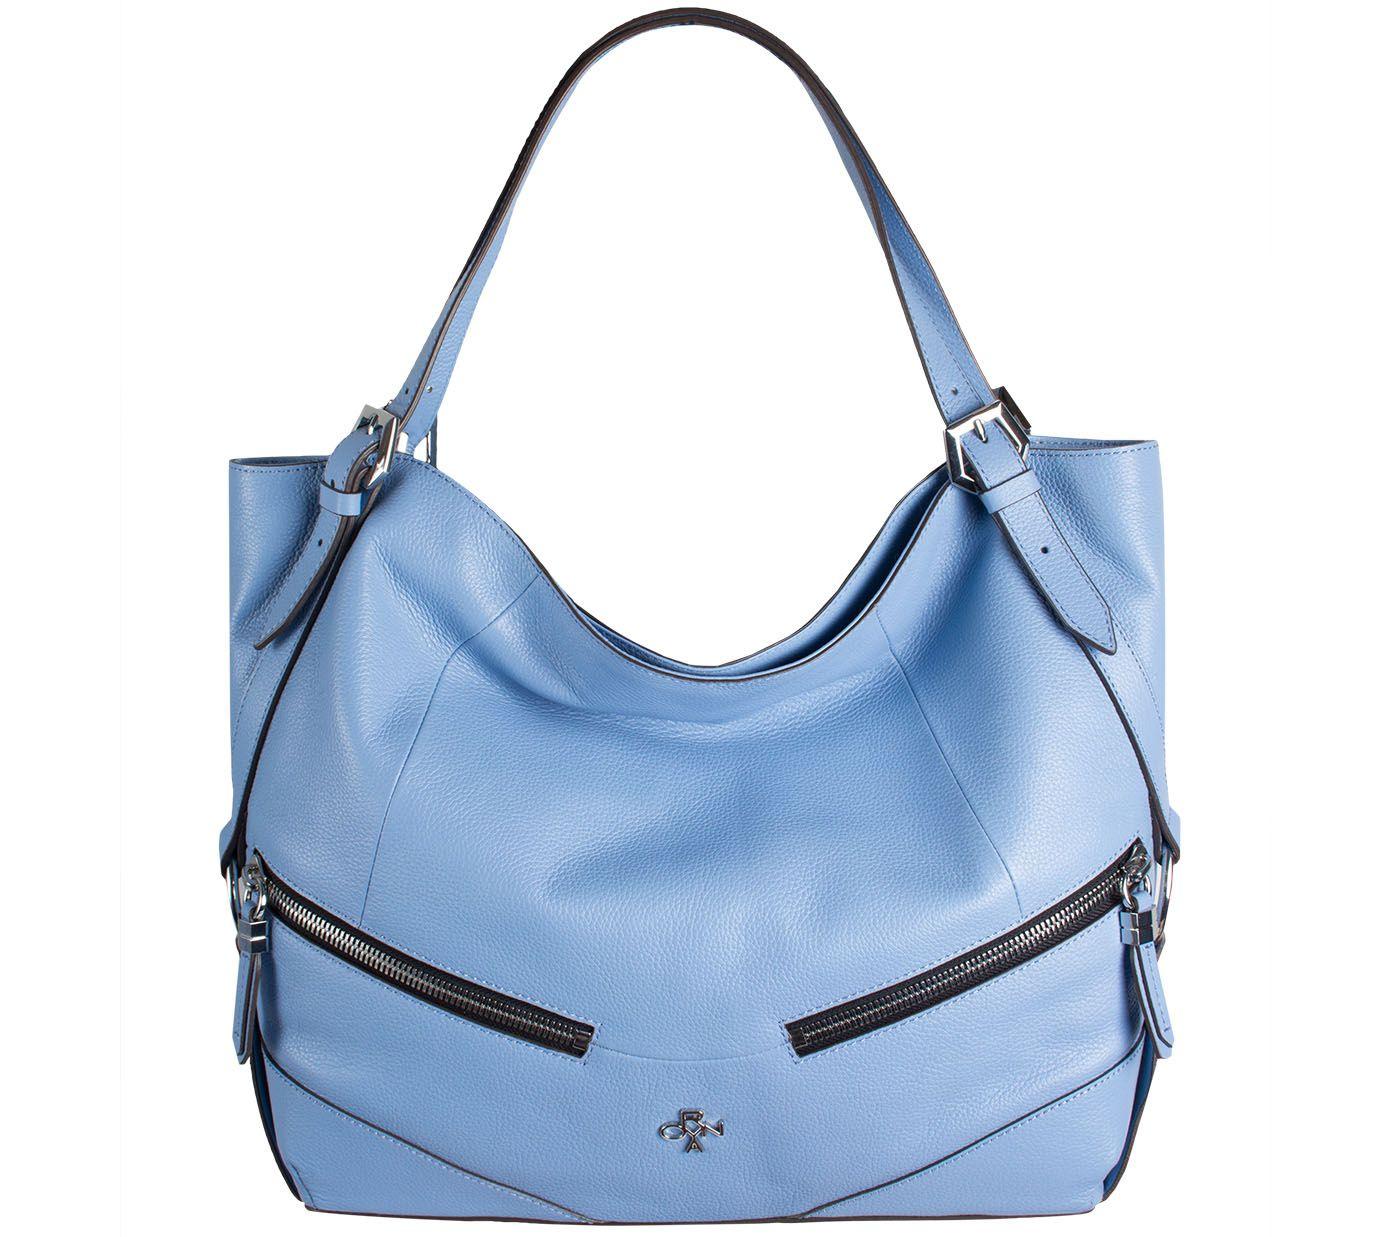 Qvc Clearance Clothing Handbags - HandBags 2018